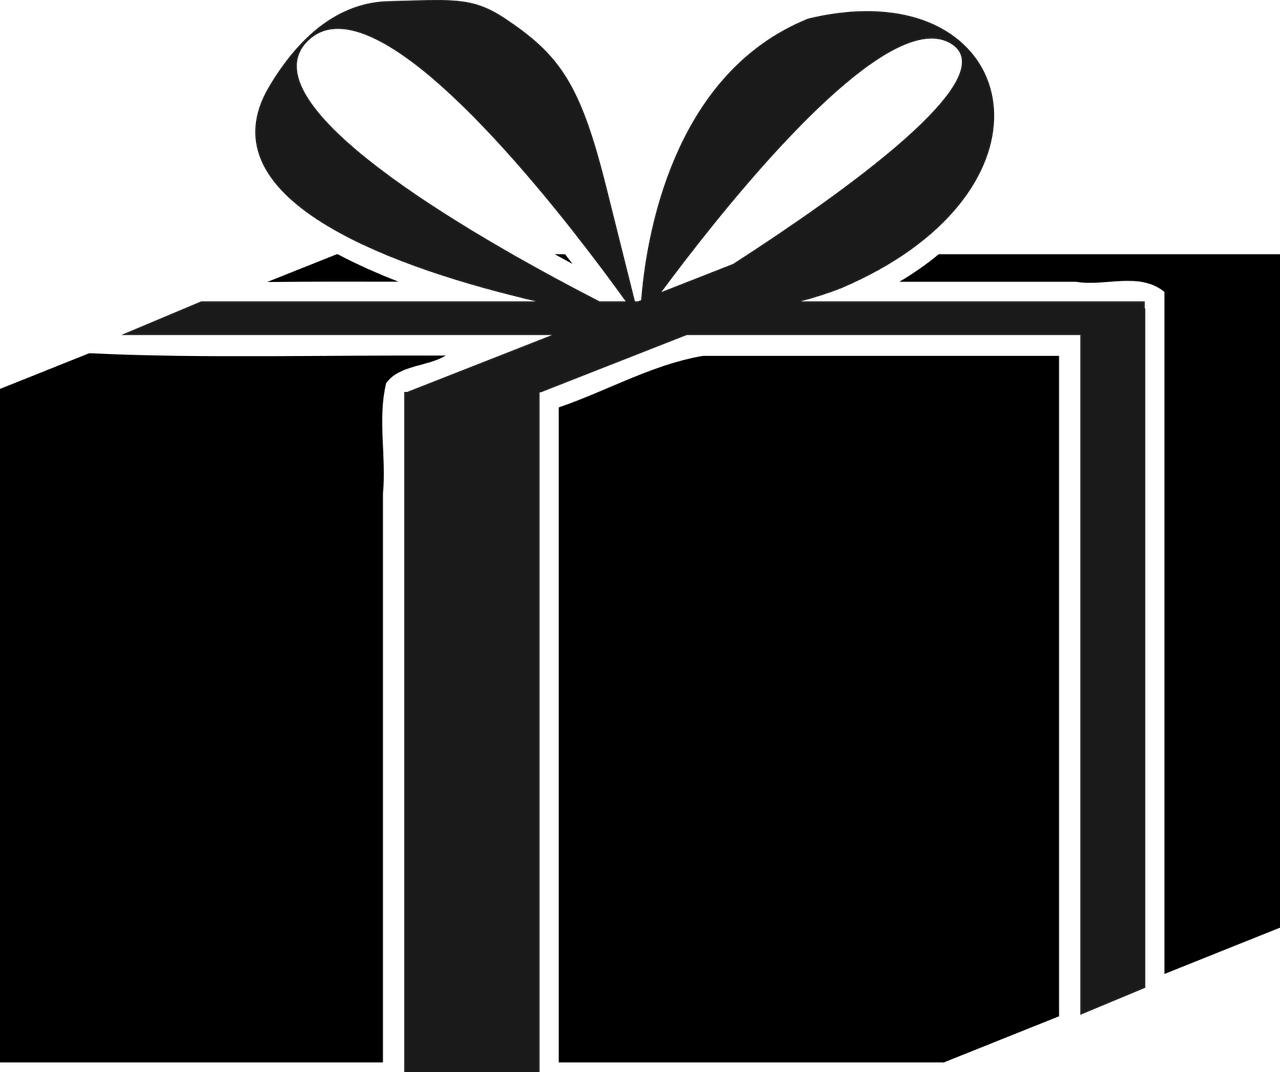 Подарок рисунок графика 81